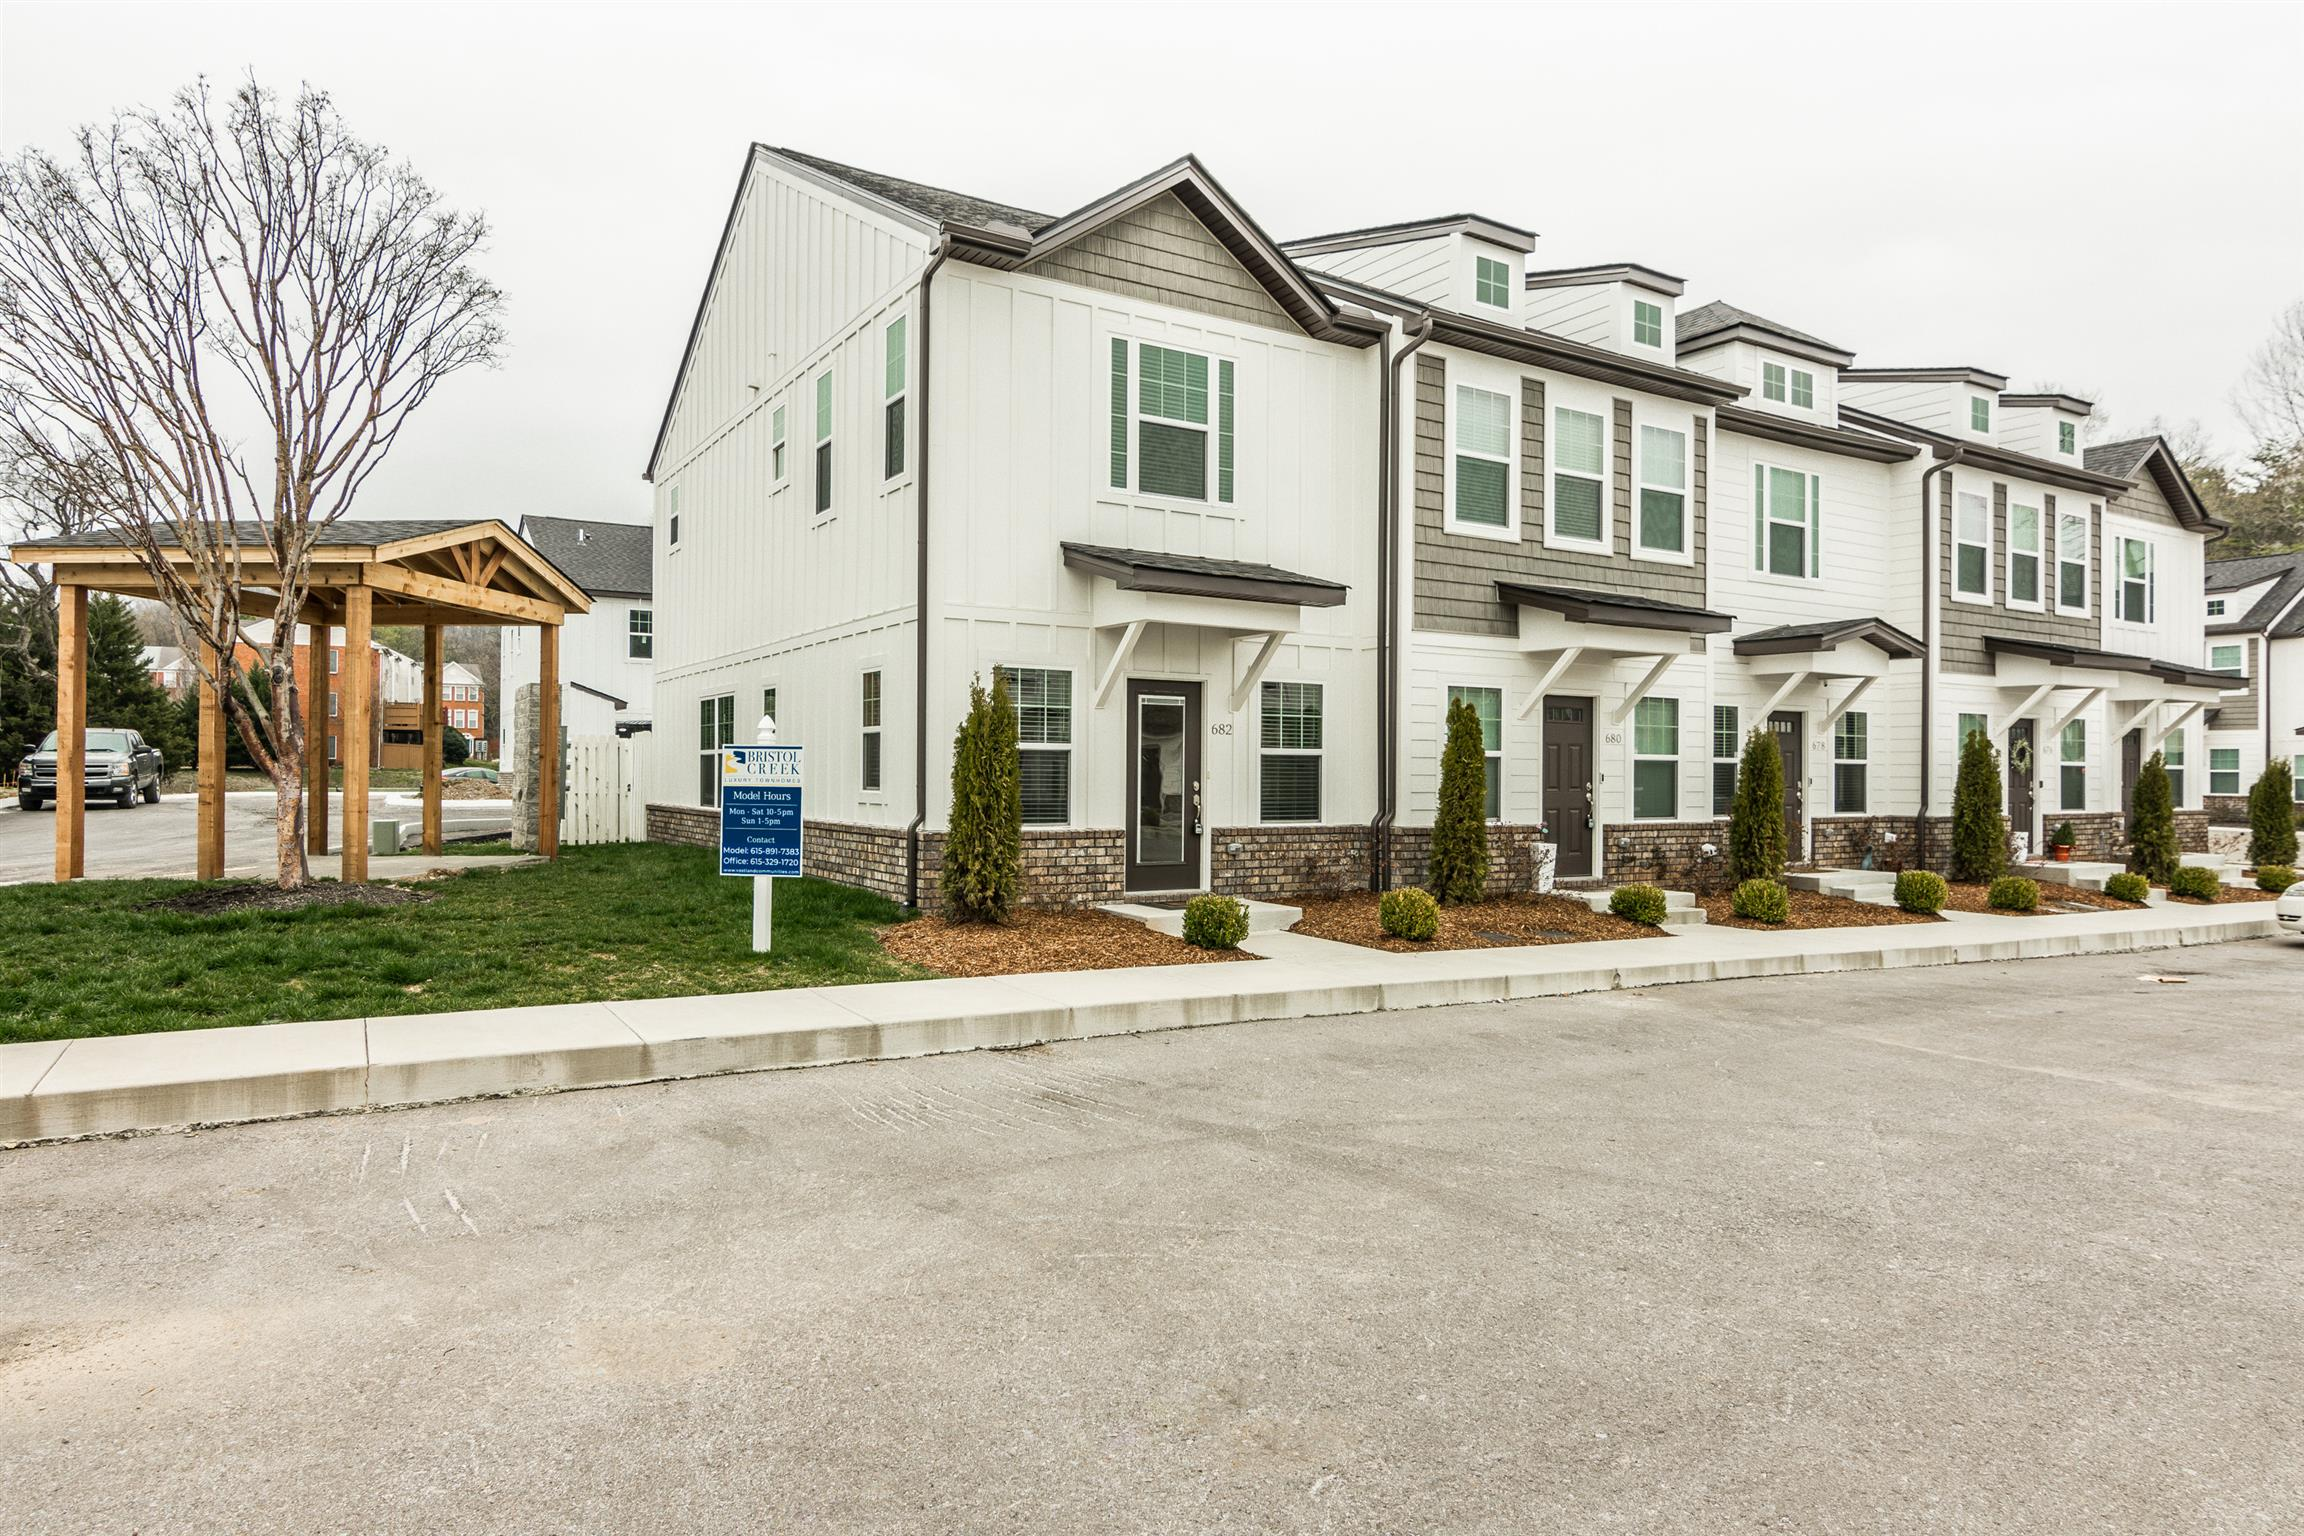 682 Bristol Creek Dr, Nashville, TN 37221 - Nashville, TN real estate listing